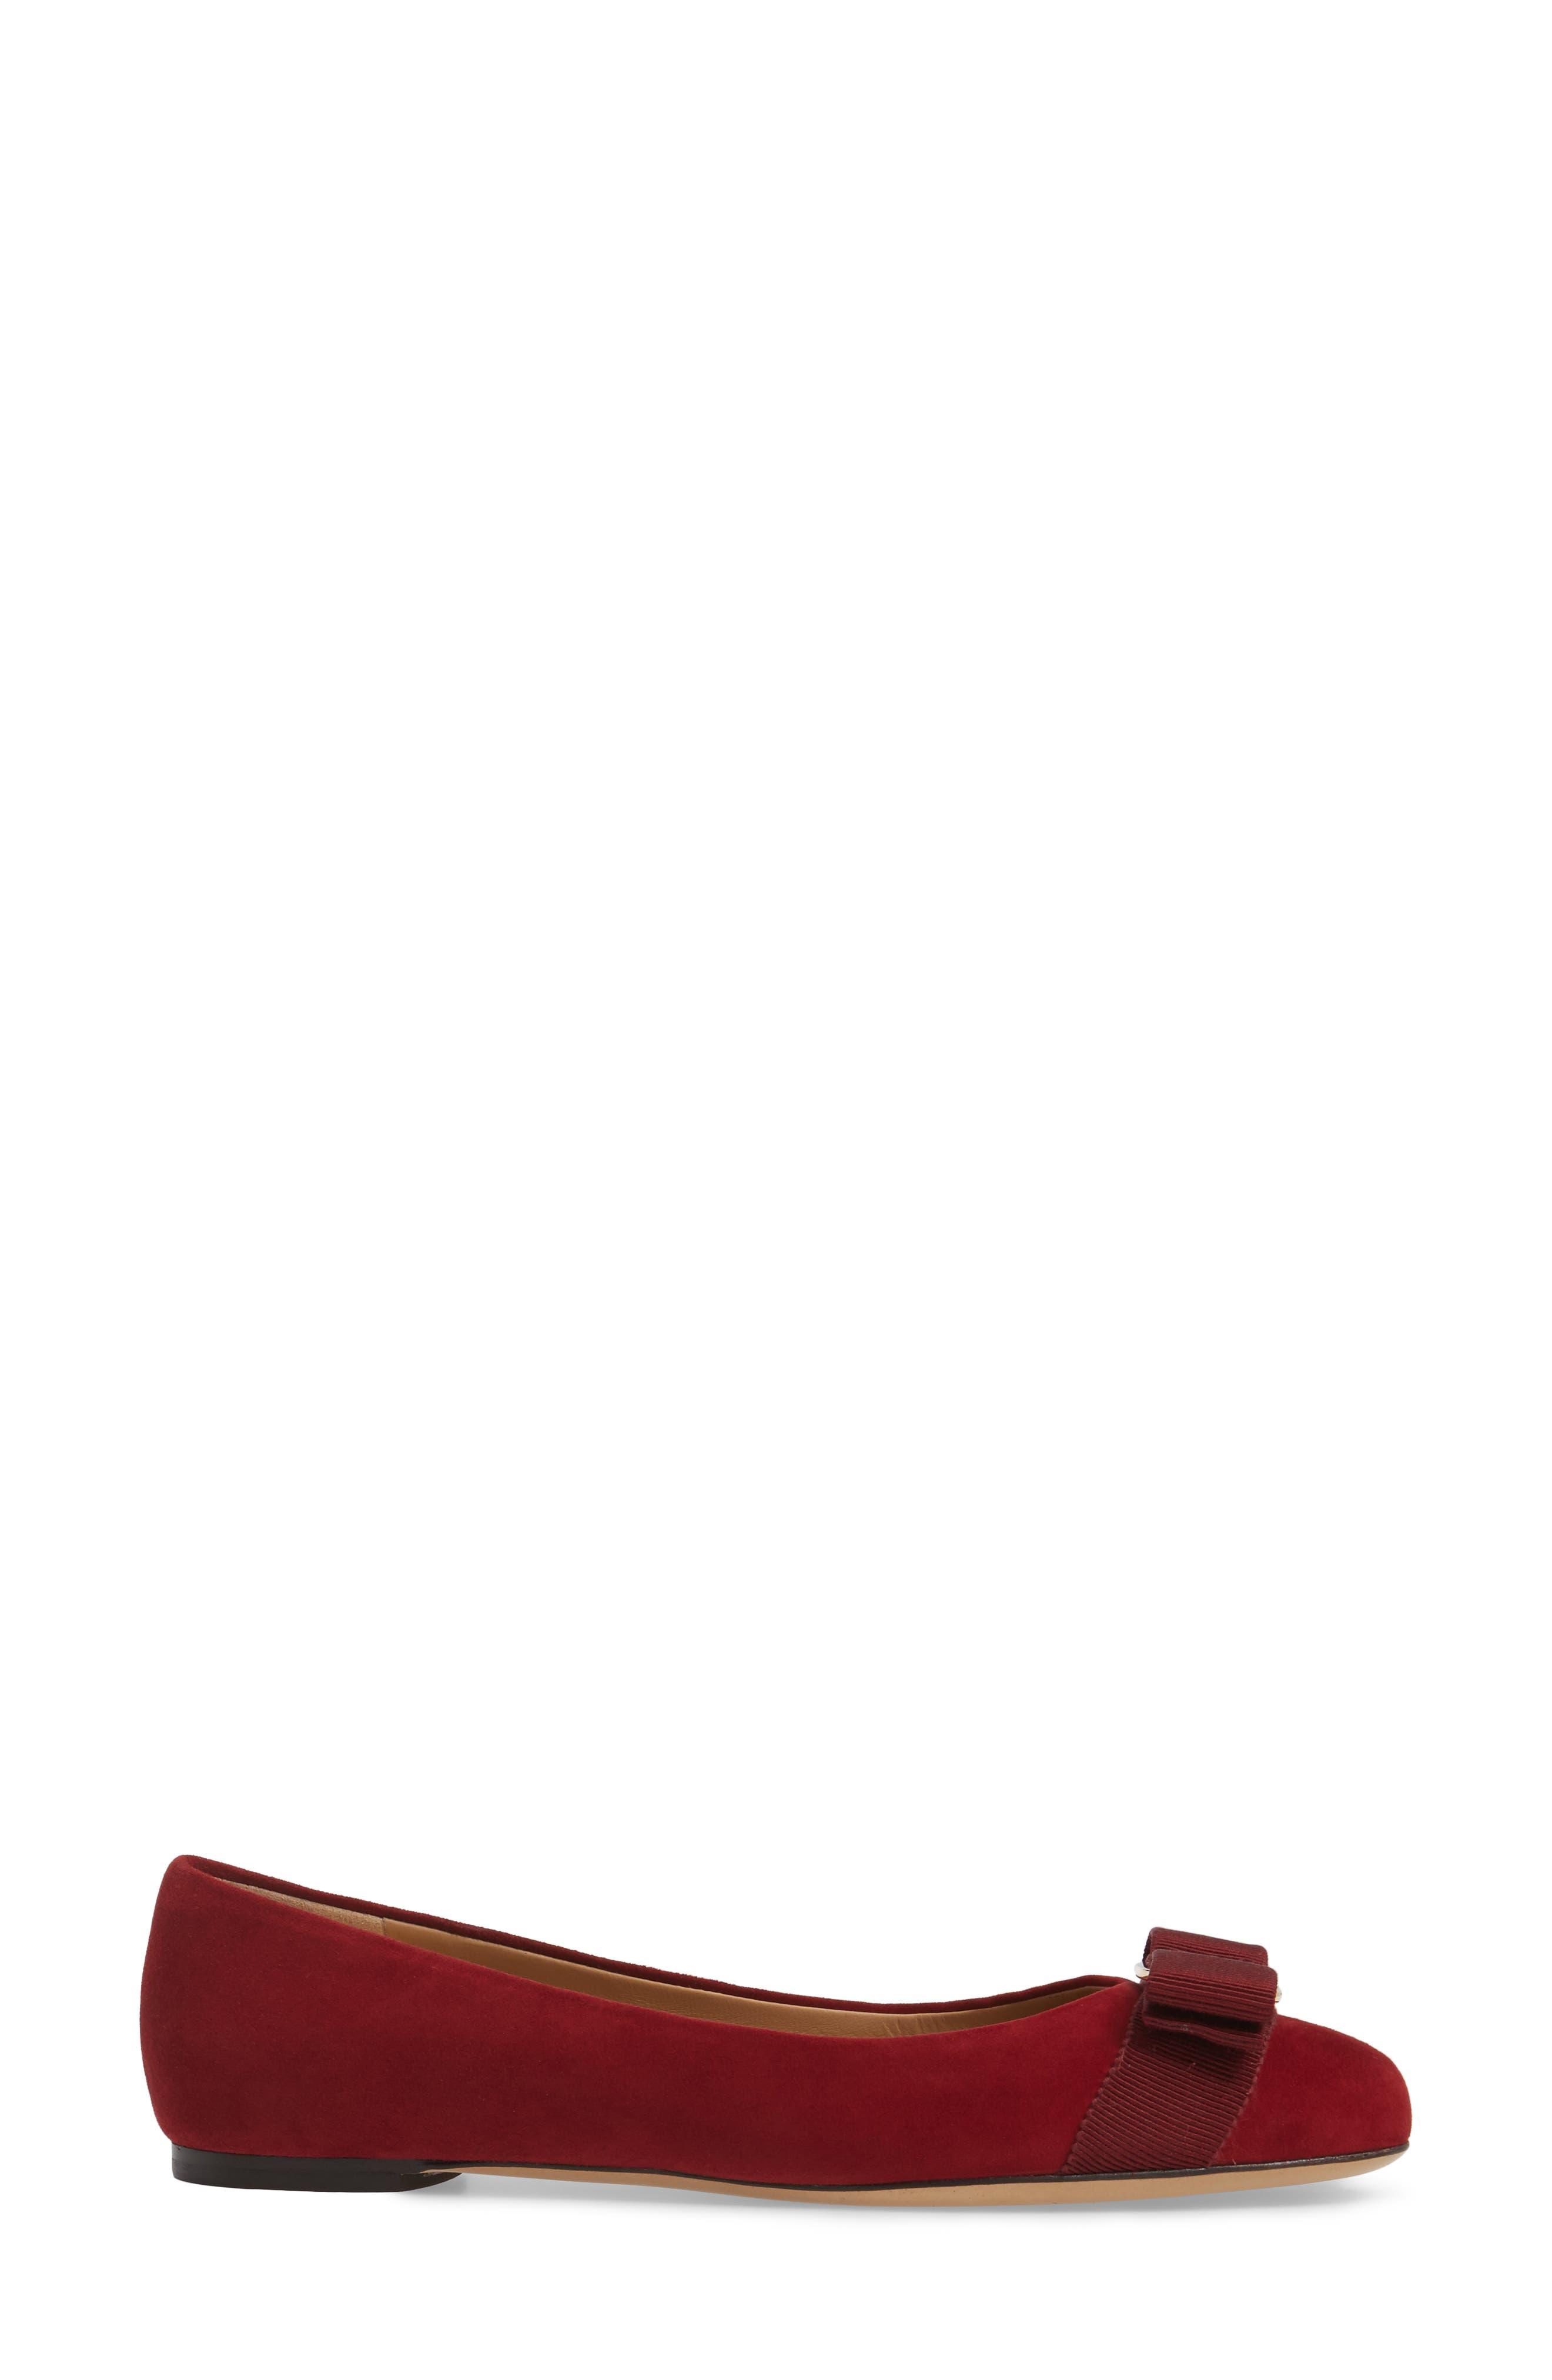 Alternate Image 3  - Salvatore Ferragamo 'Varina' Leather Flat (Women)